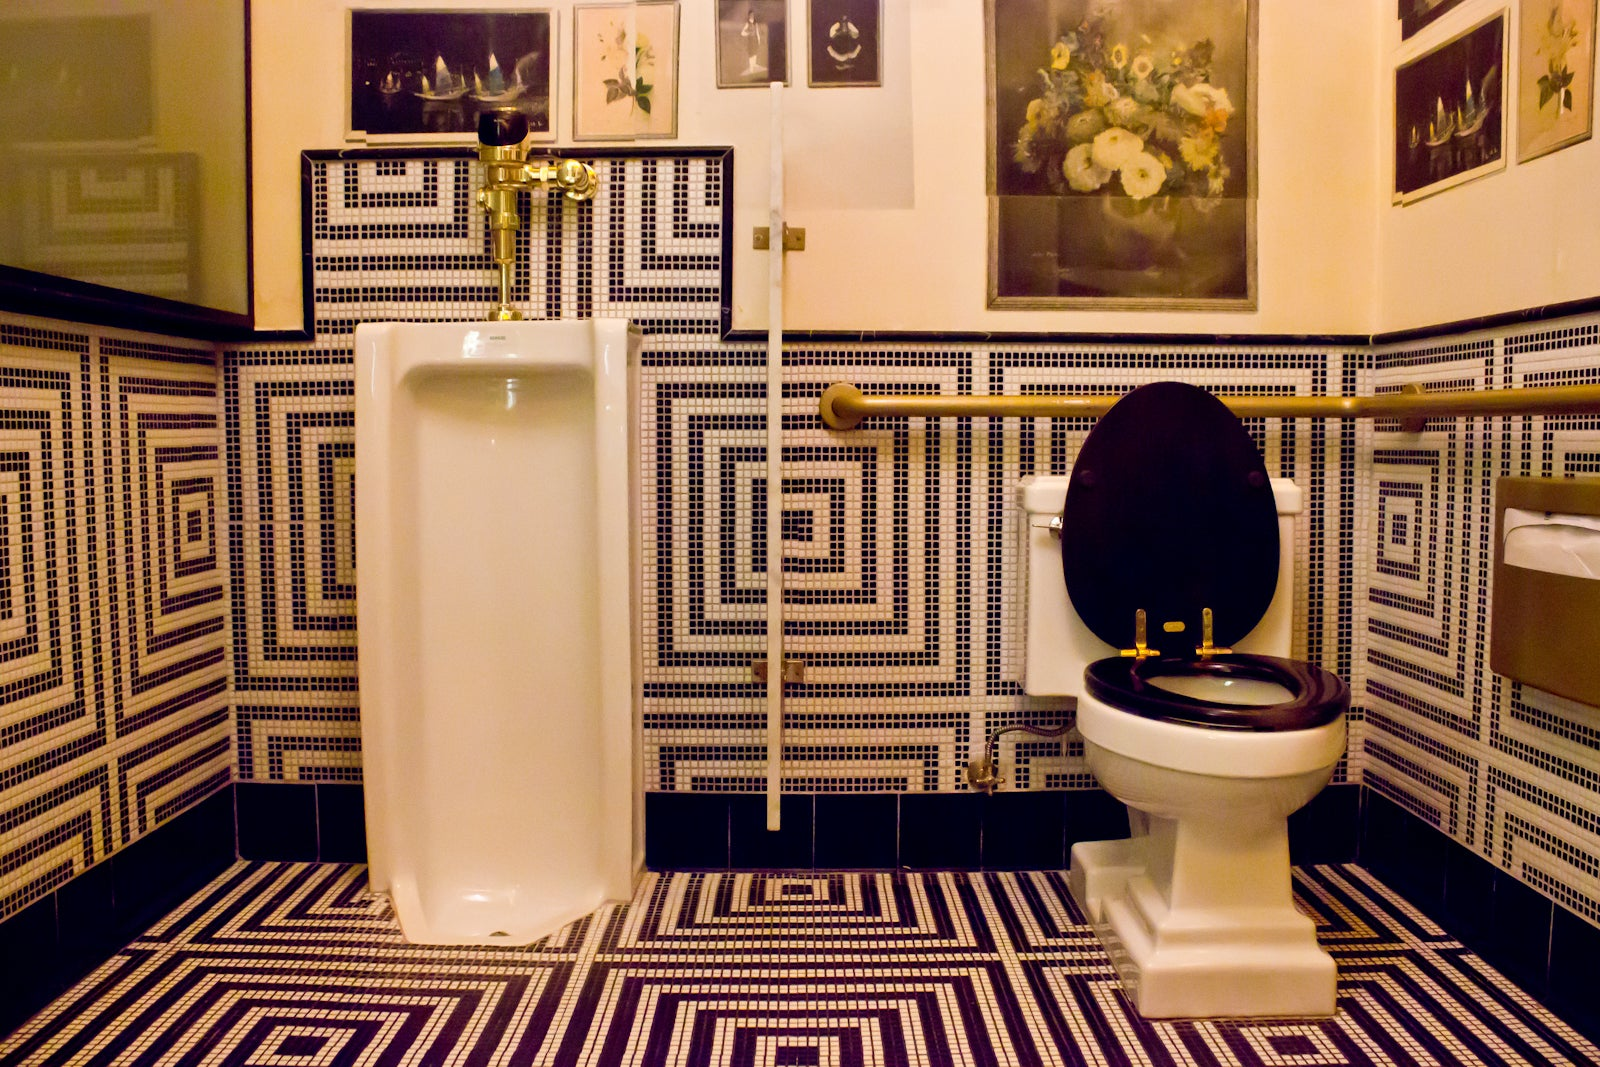 Bathroom Design San Francisco awesome design ideas restaurant bathroom designs 7 office restroom